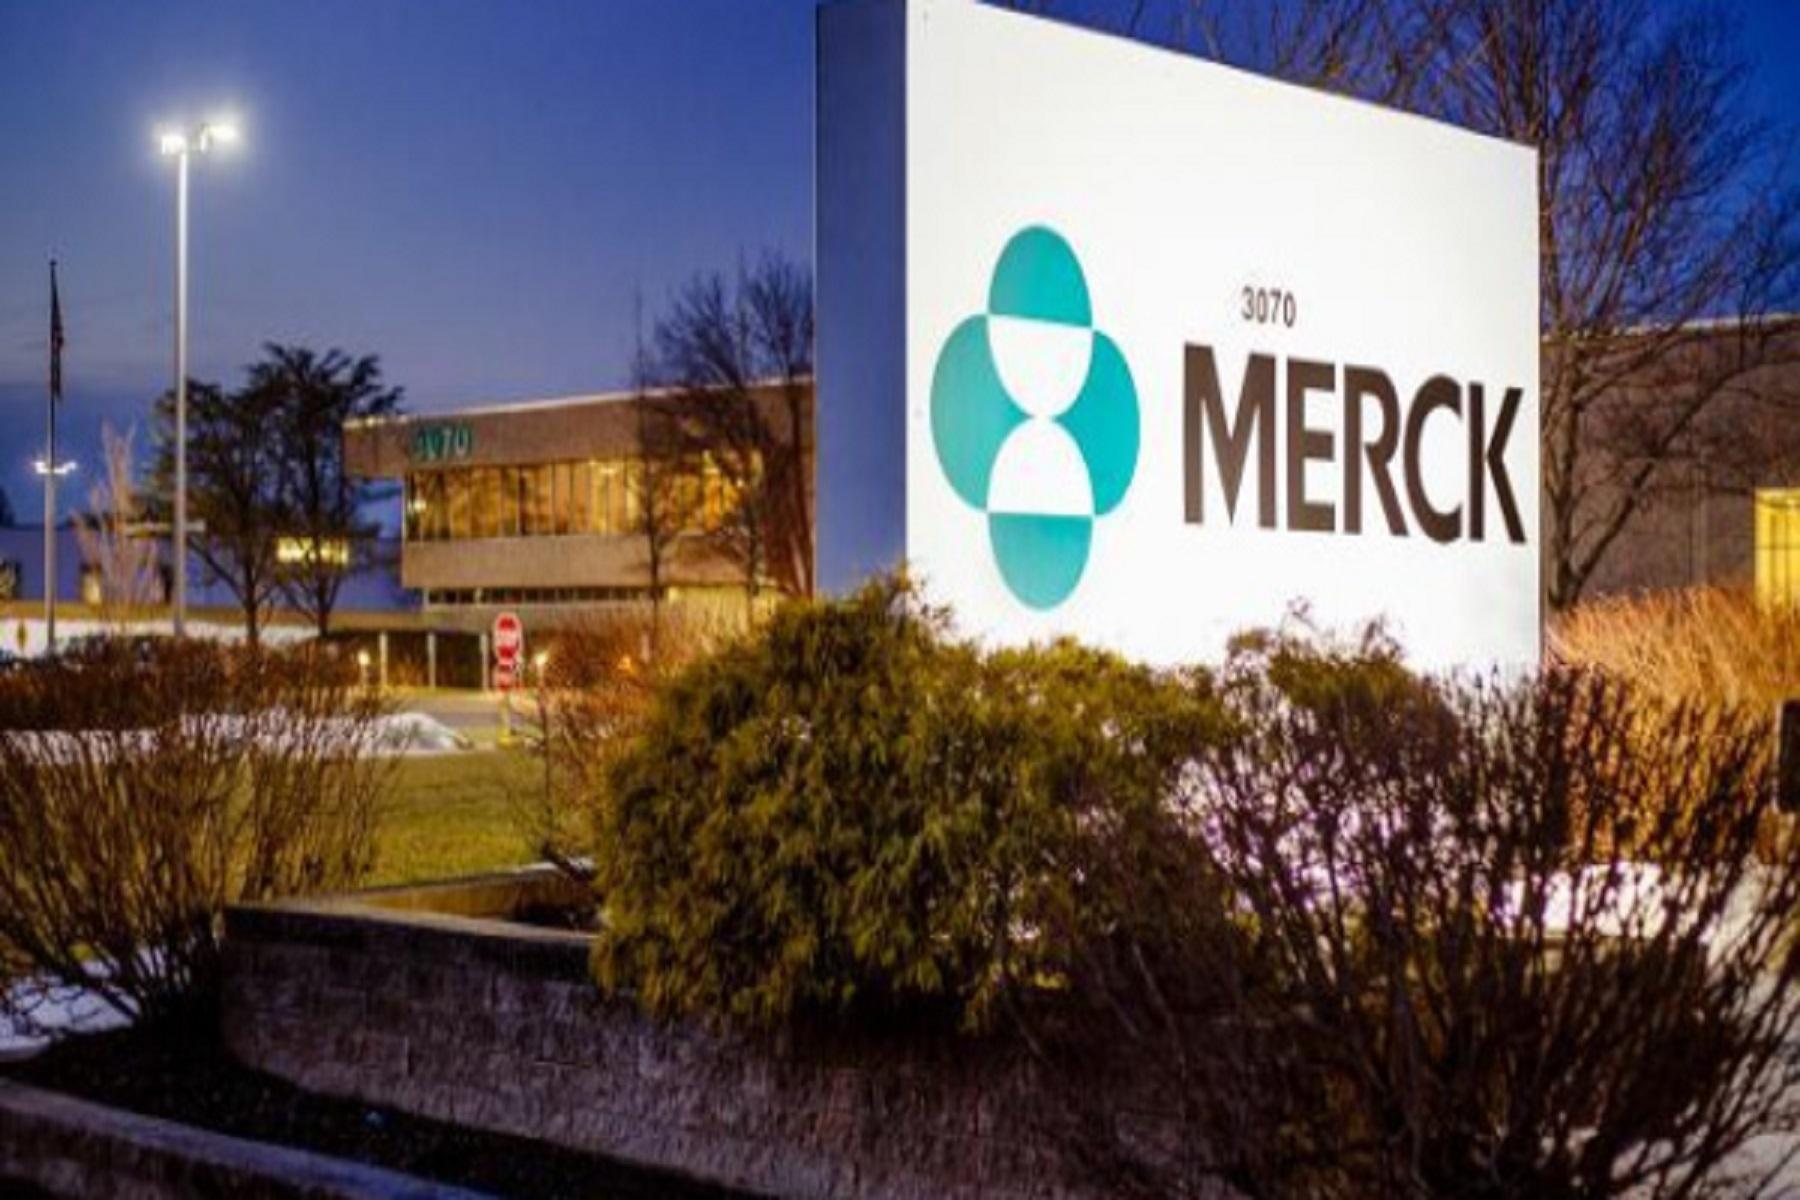 Merck Φαρμακοβιομηχανία: Η Caroline Litchfield νέα οικονομική διευθύντρια του φαρμακευτικού κολοσσού